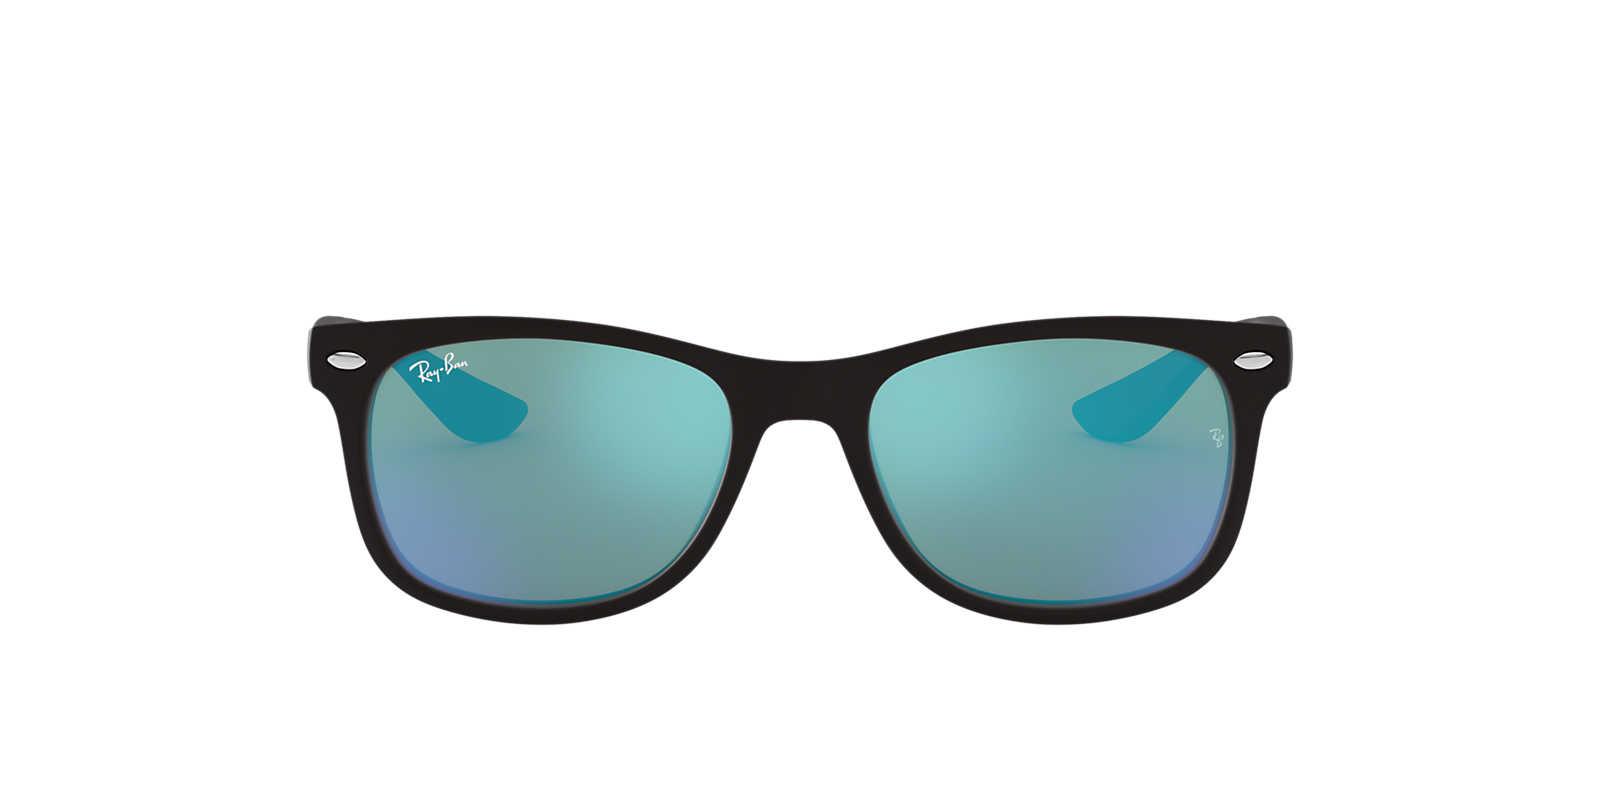 ray ban sunglasses one day sale hub5  RJ9052S NEW WAYFARER KIDS